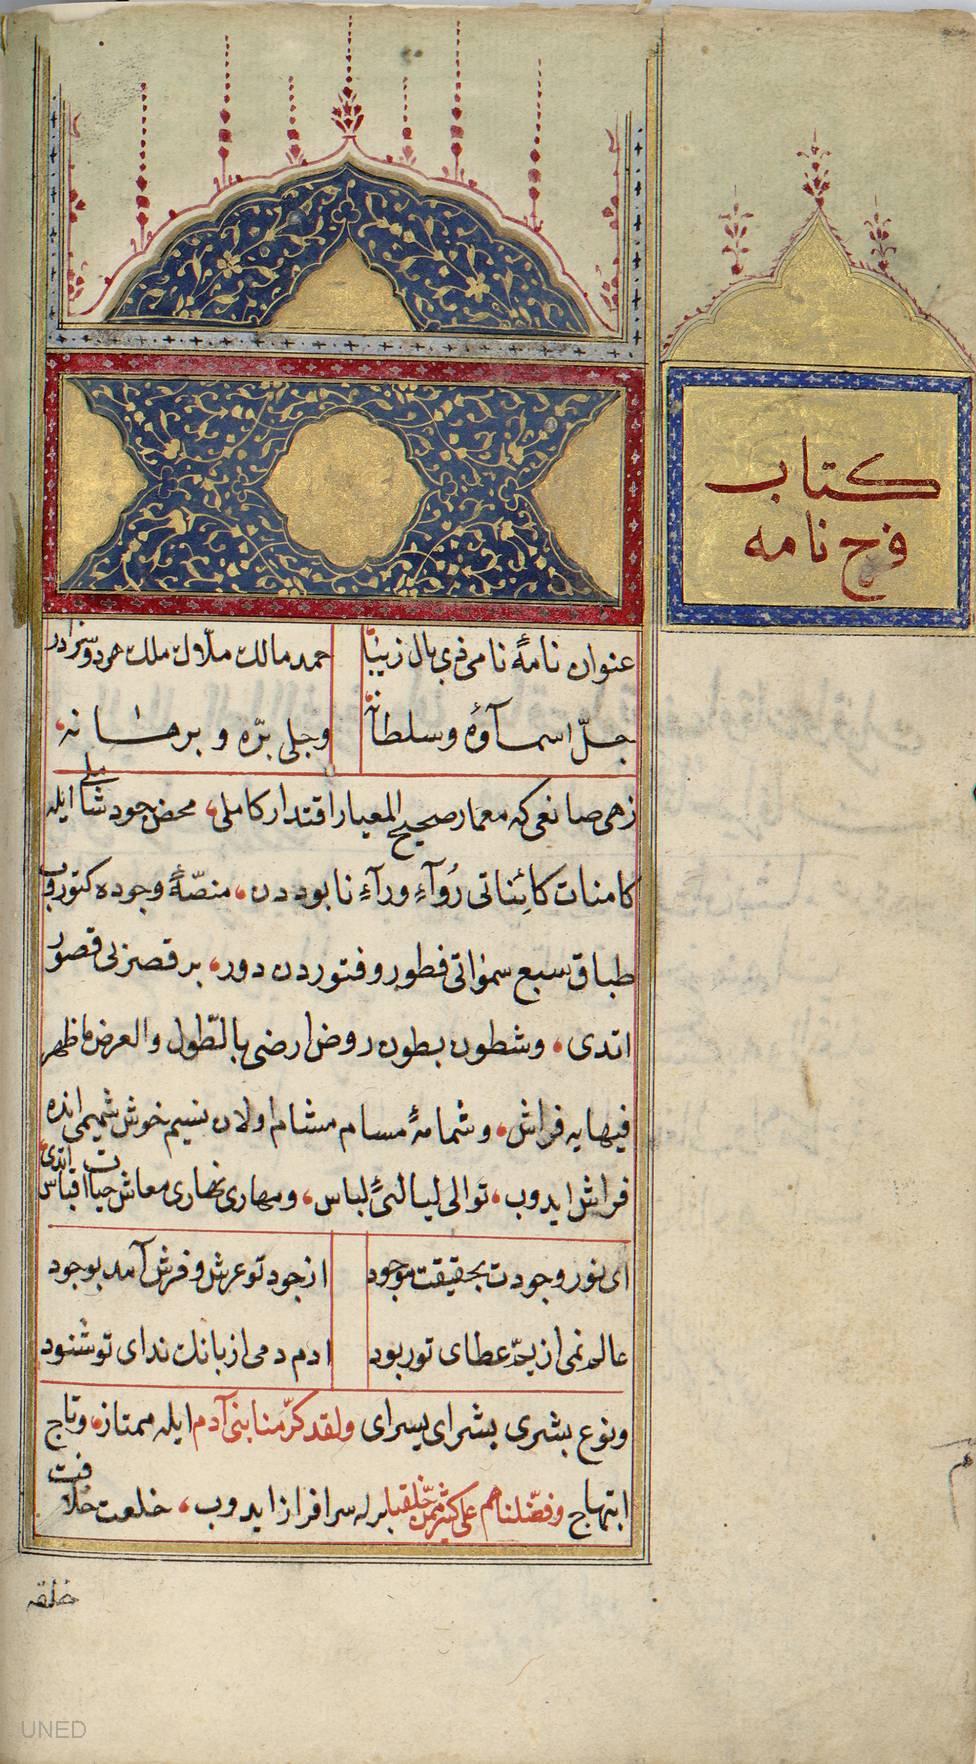 Kitab farah name, anterior a 1798